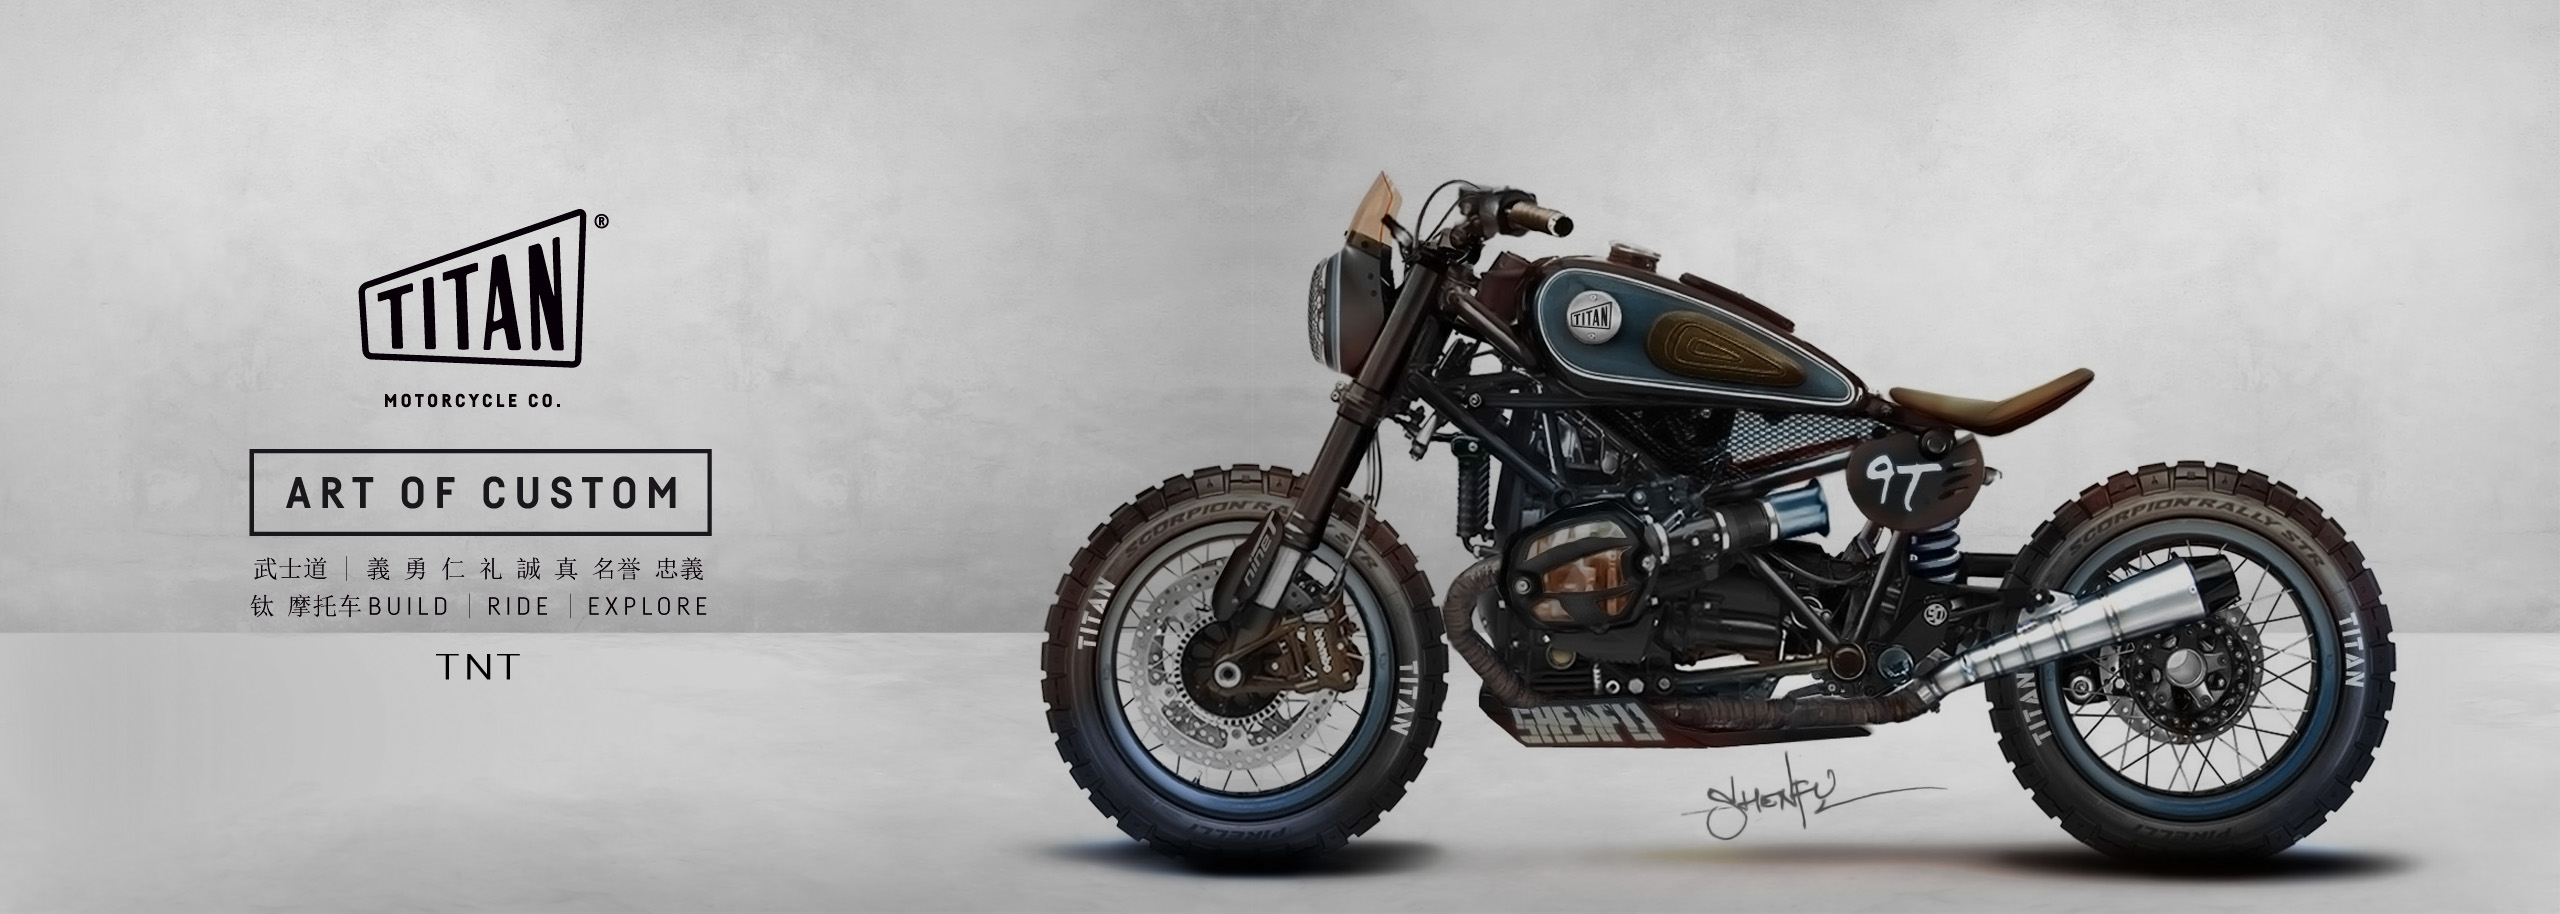 TITAN-Heritage_Concept_BMW-Motorrad-Österreich-Cafe-Racer BMW Motorrad Concept